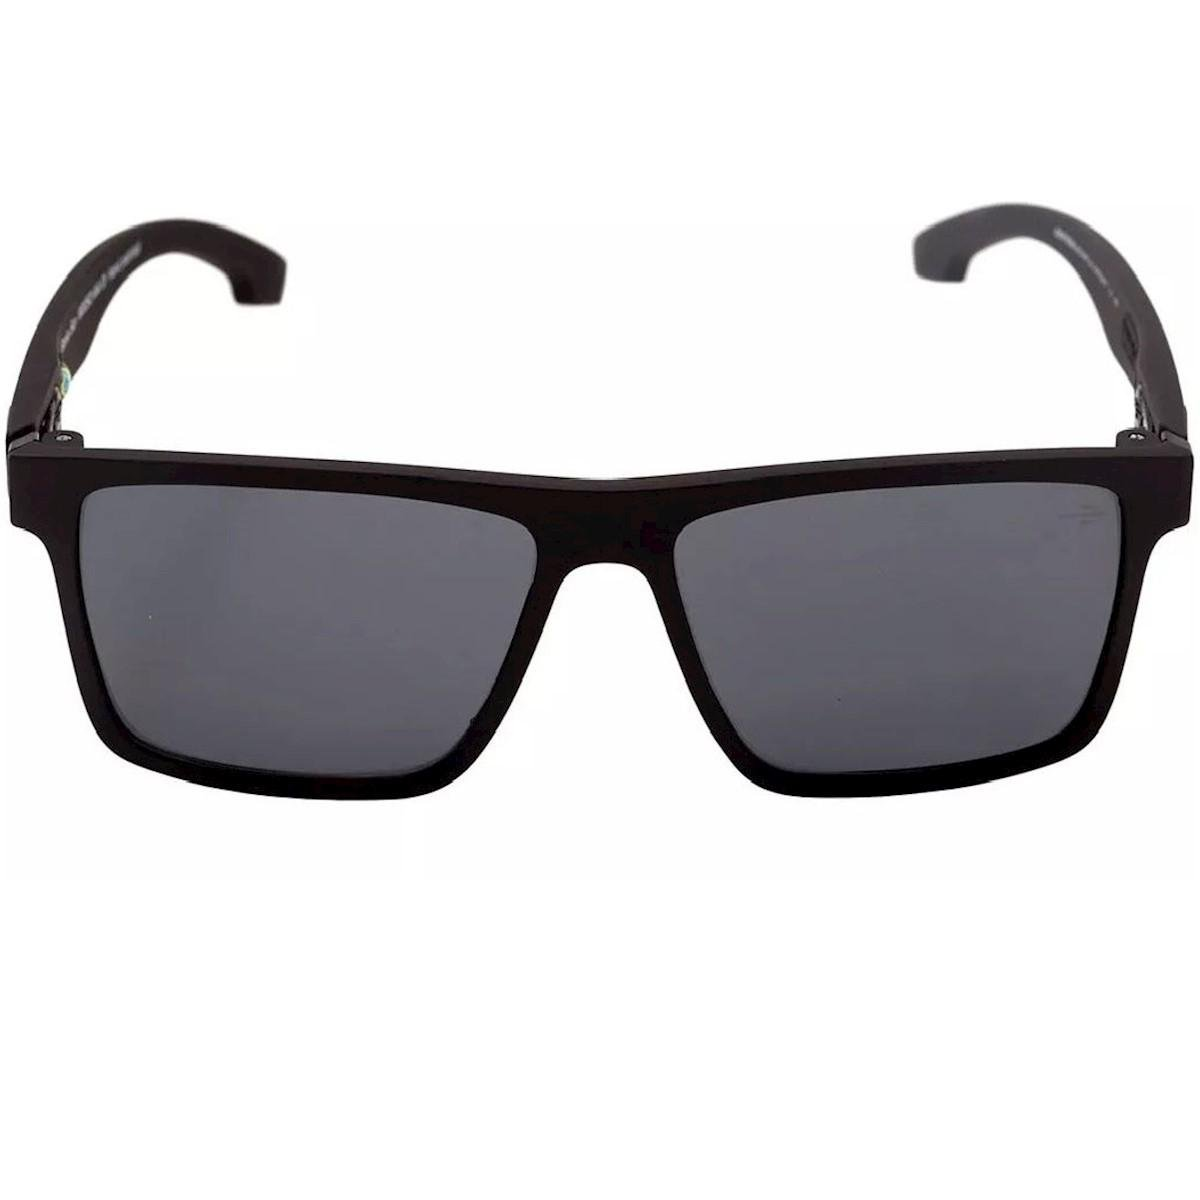 e4a9139d25f87 Óculos de Sol Mormaii Banks Masculino - Preto - Compre Agora   Netshoes